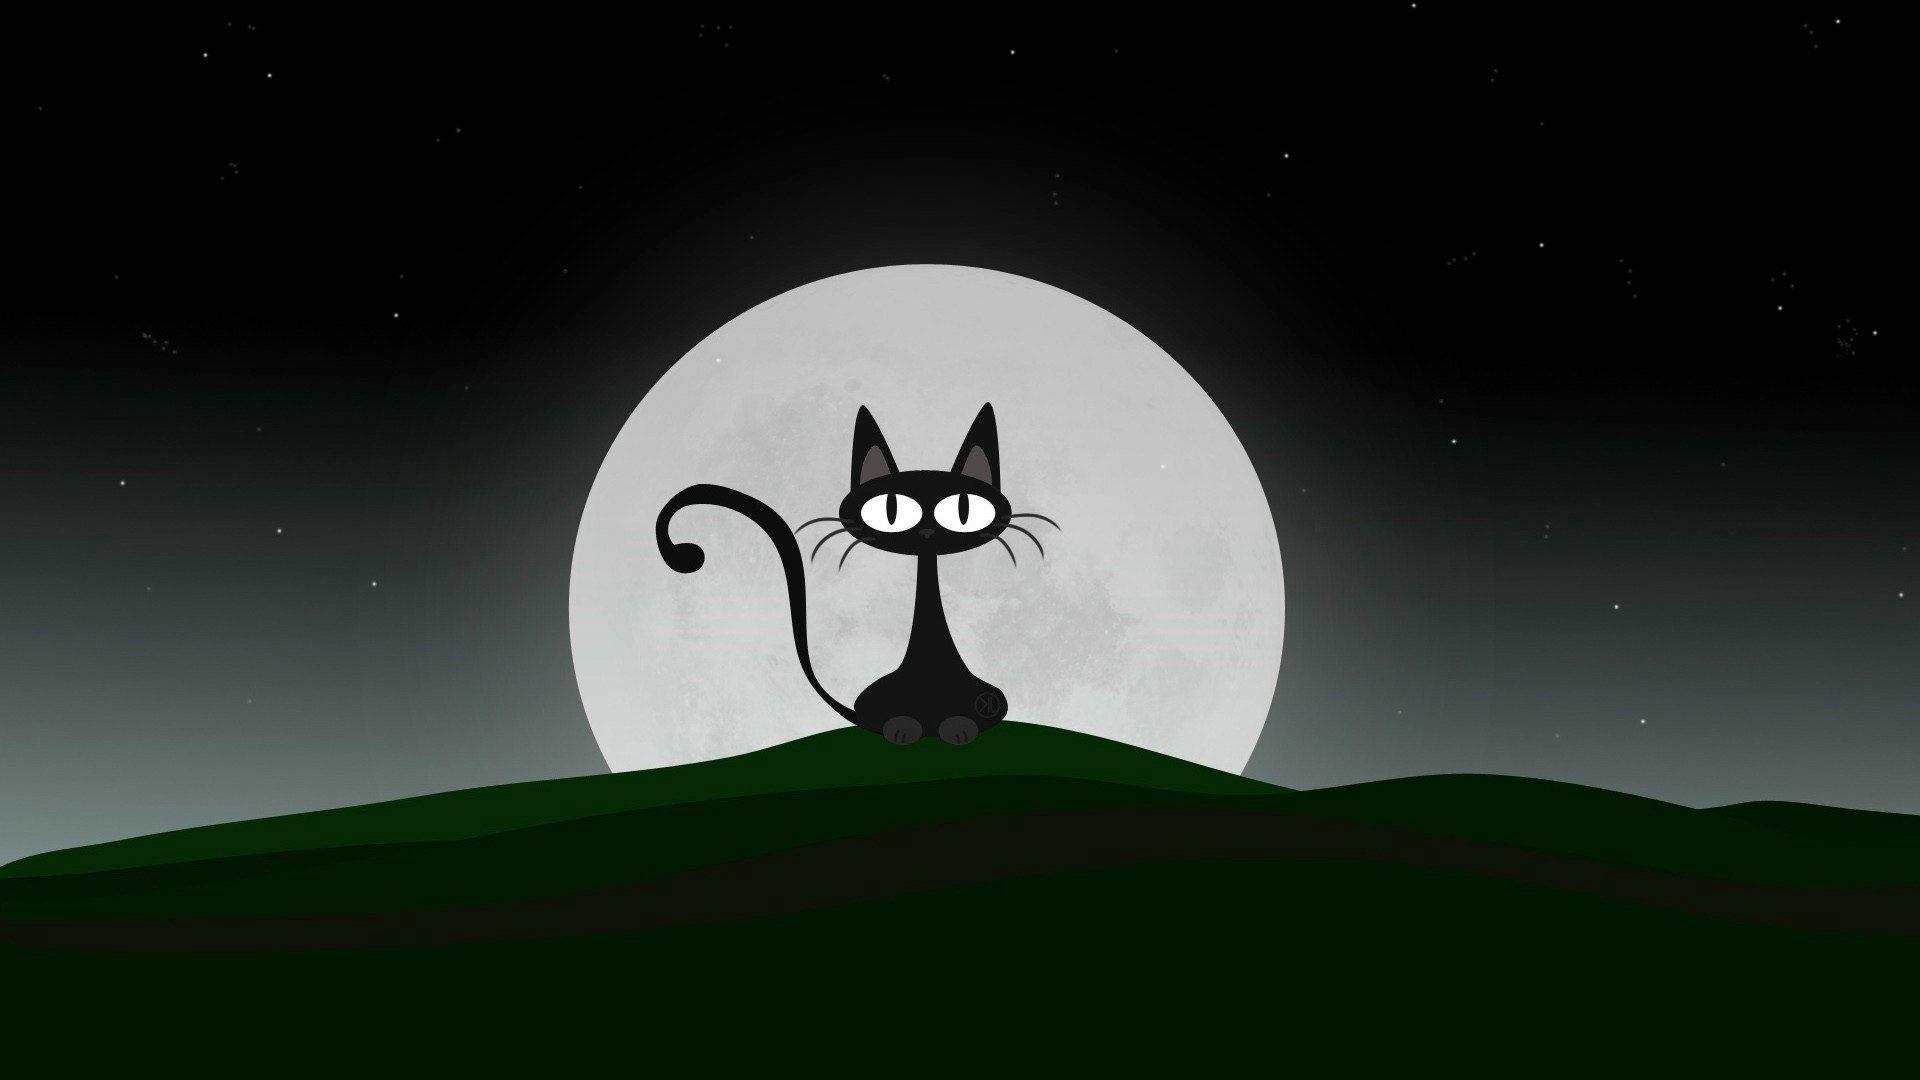 Black moon 1920x1080 hd black cat and moon desktop wallpapers black moon 1920x1080 hd black cat and moon desktop wallpapers backgrounds publicscrutiny Choice Image